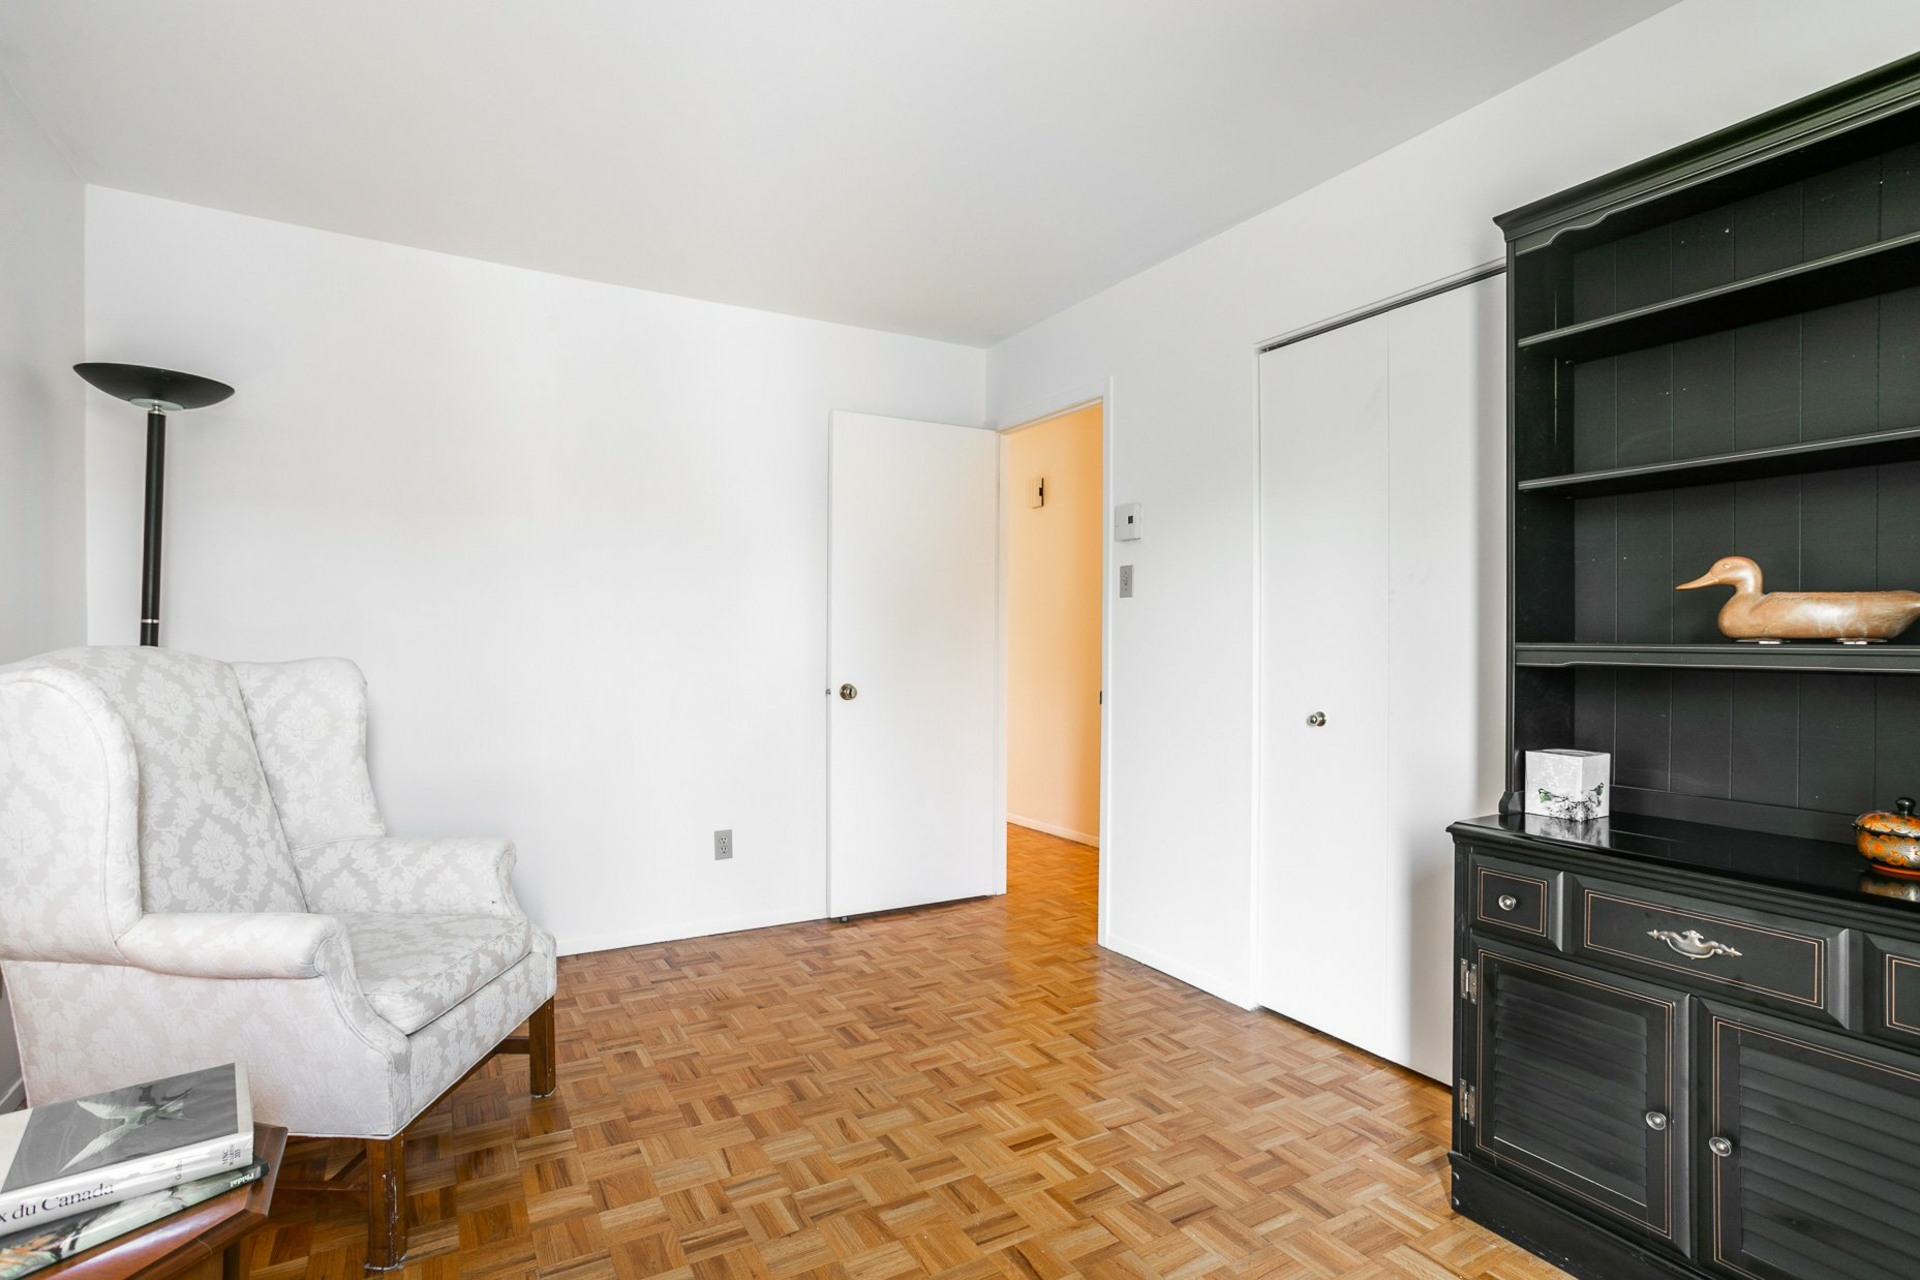 image 11 - House For sale Pierrefonds-Roxboro Montréal  - 8 rooms